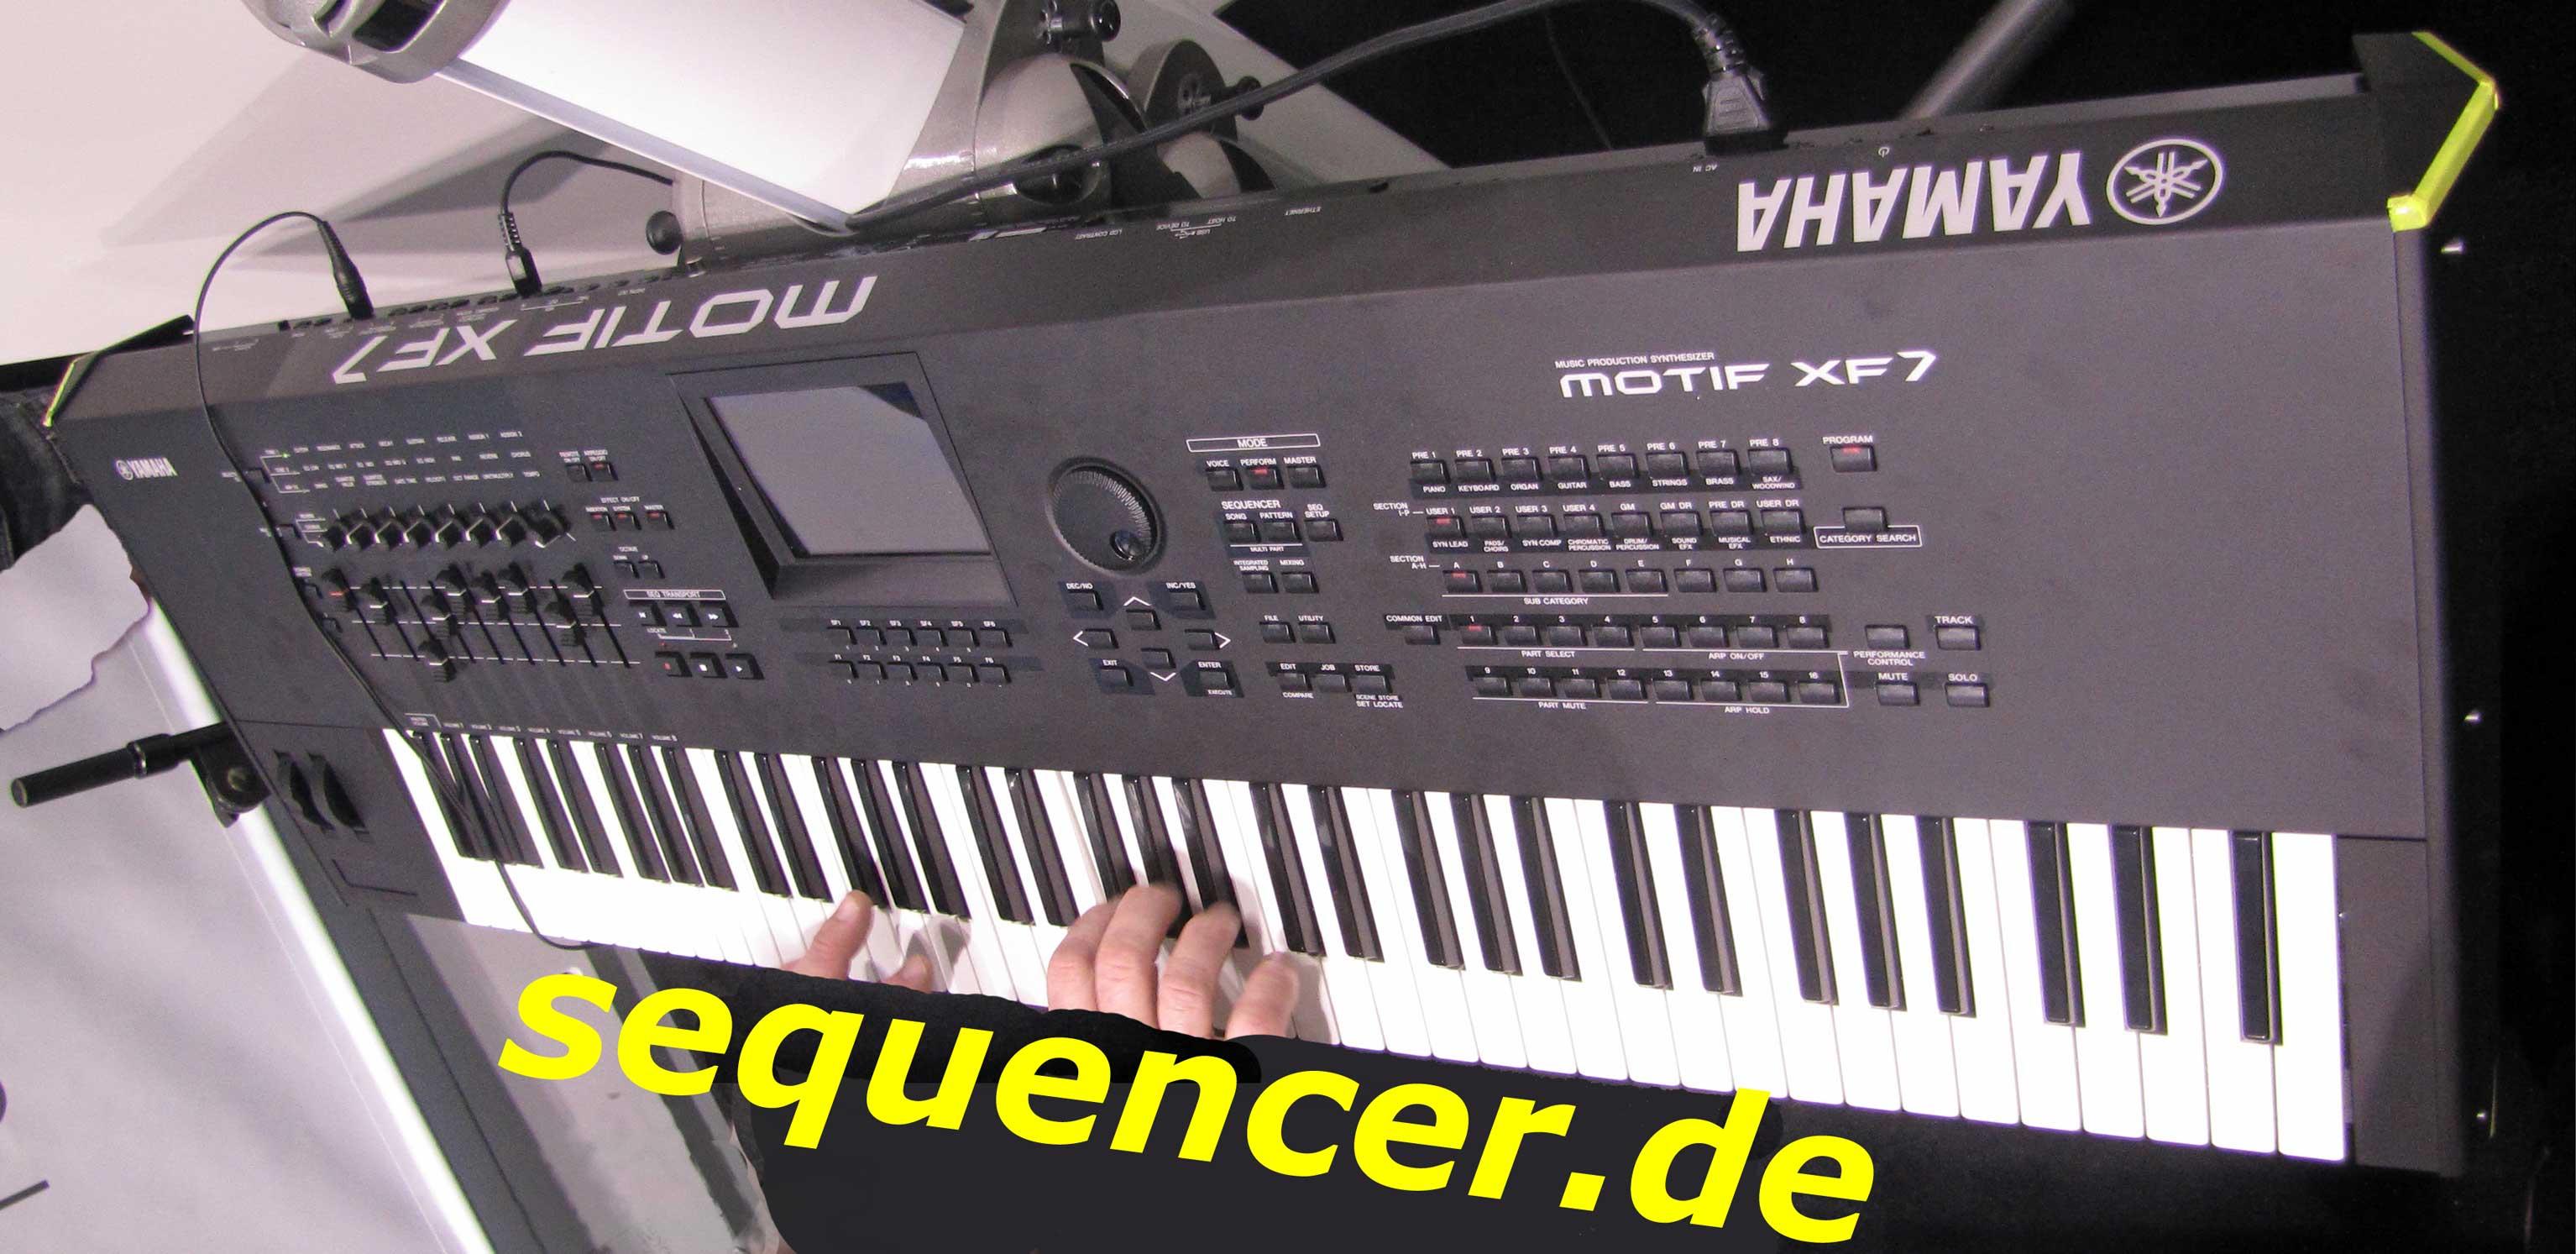 Yamaha Motif XF6, Motif XF7, Motif XF8 synthesizer